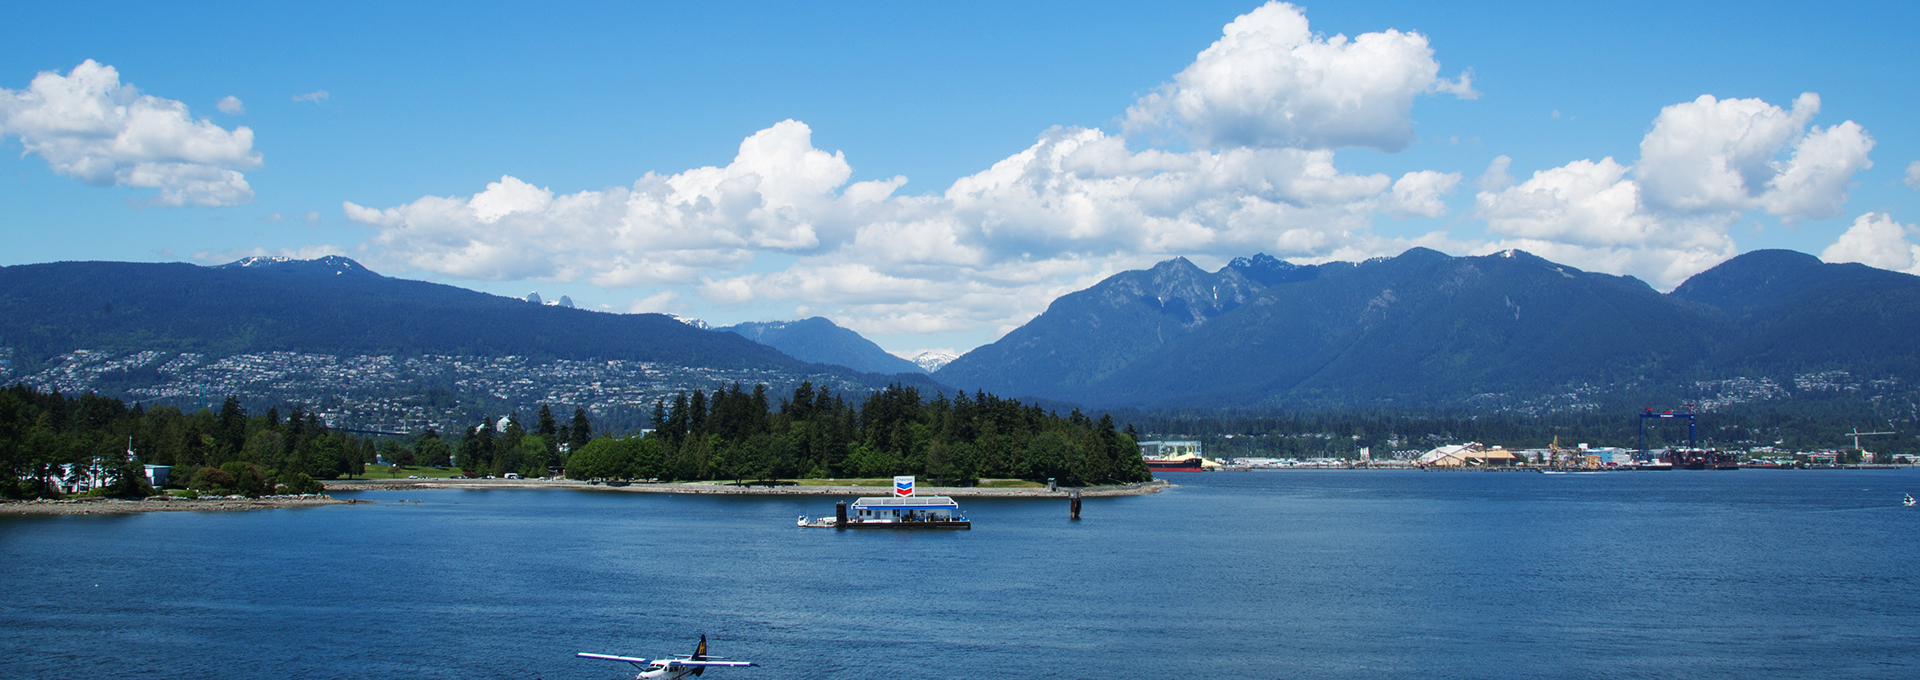 Horizon of Vancouver Stanley Park